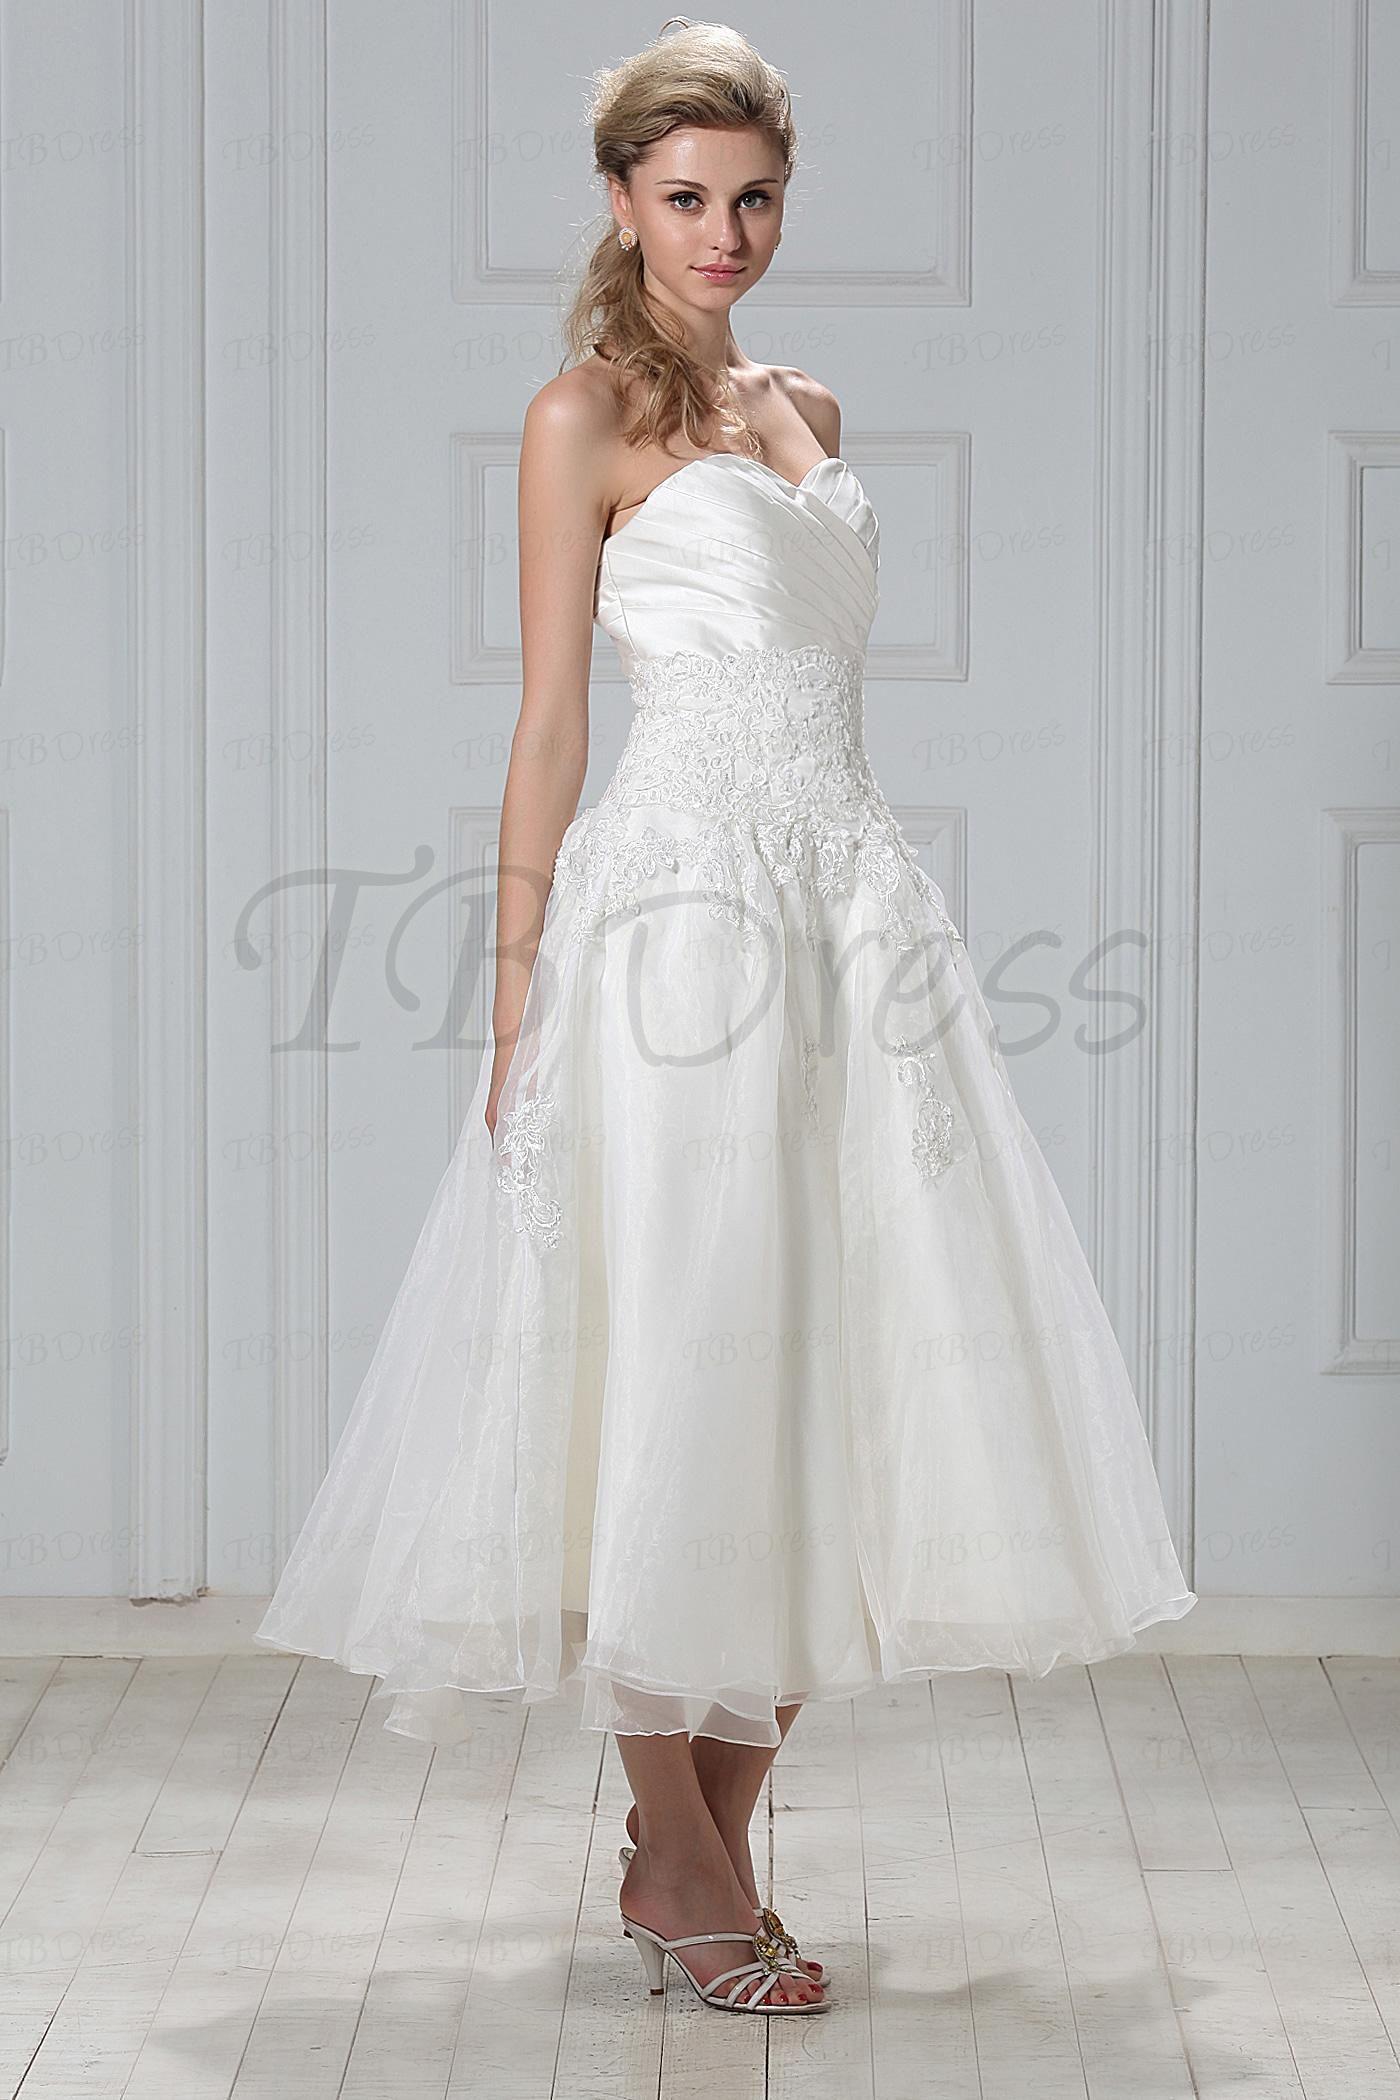 Sweetheart aline tealength appliques talineus wedding dress tea